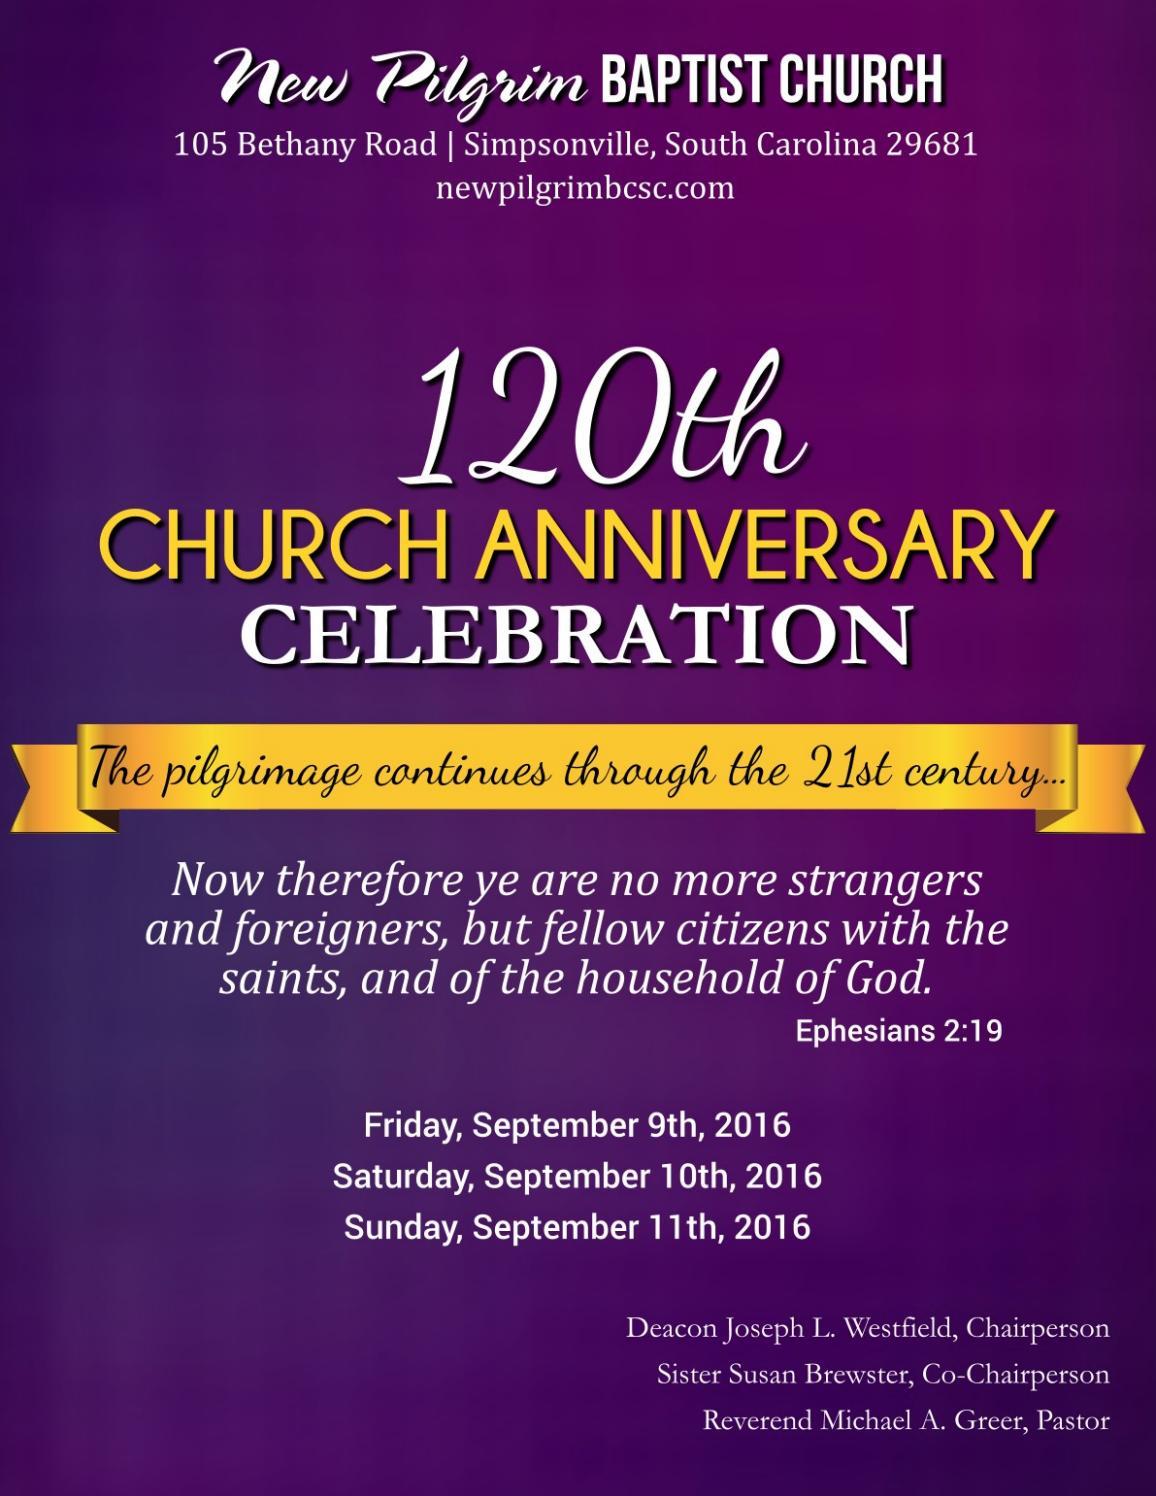 120th Church Anniversary Booklet By New Pilgrim Baptist